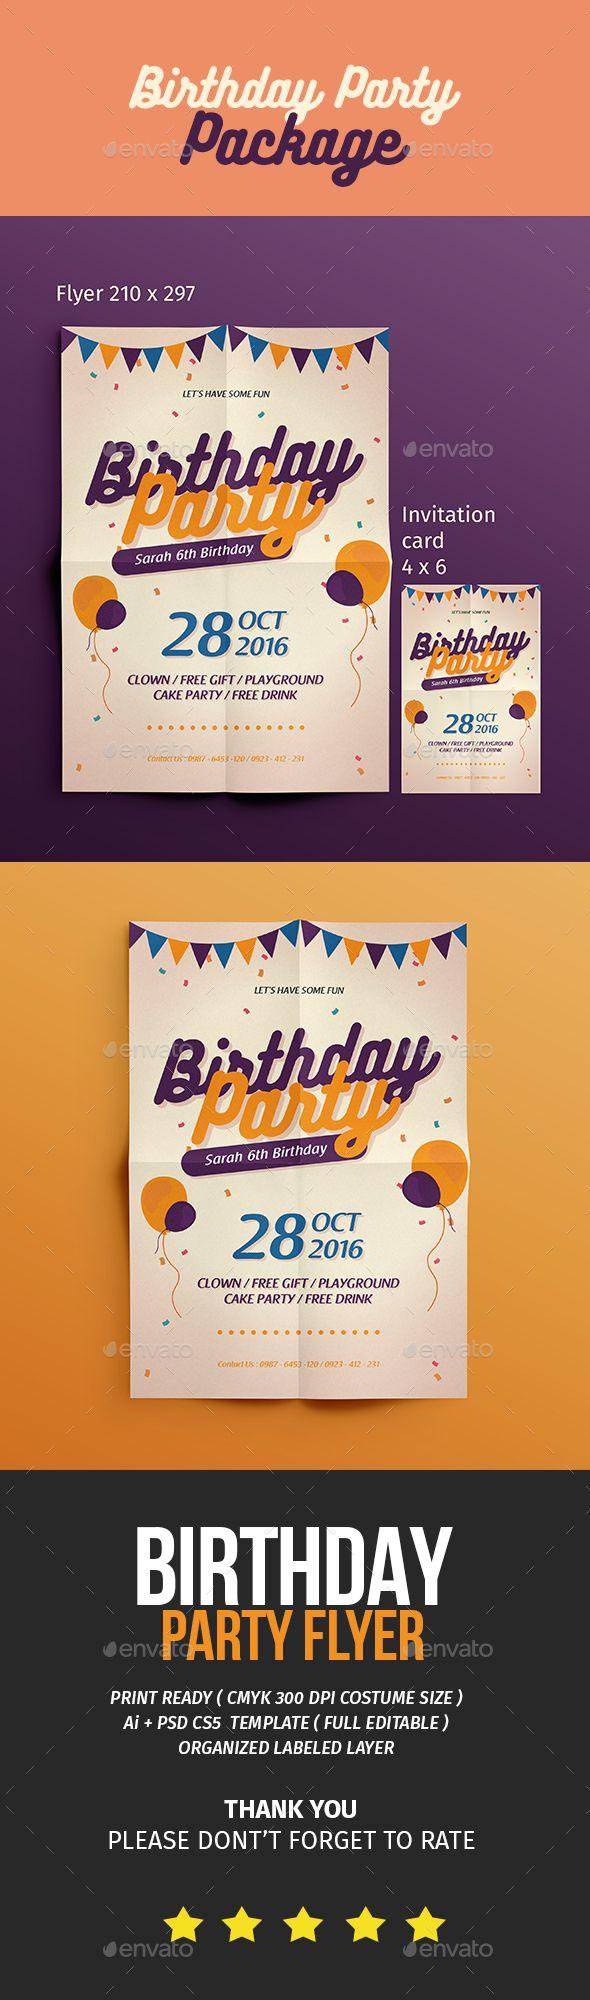 Birthday Flyer Invitation Birthdays Ai Illustrator And Flyer